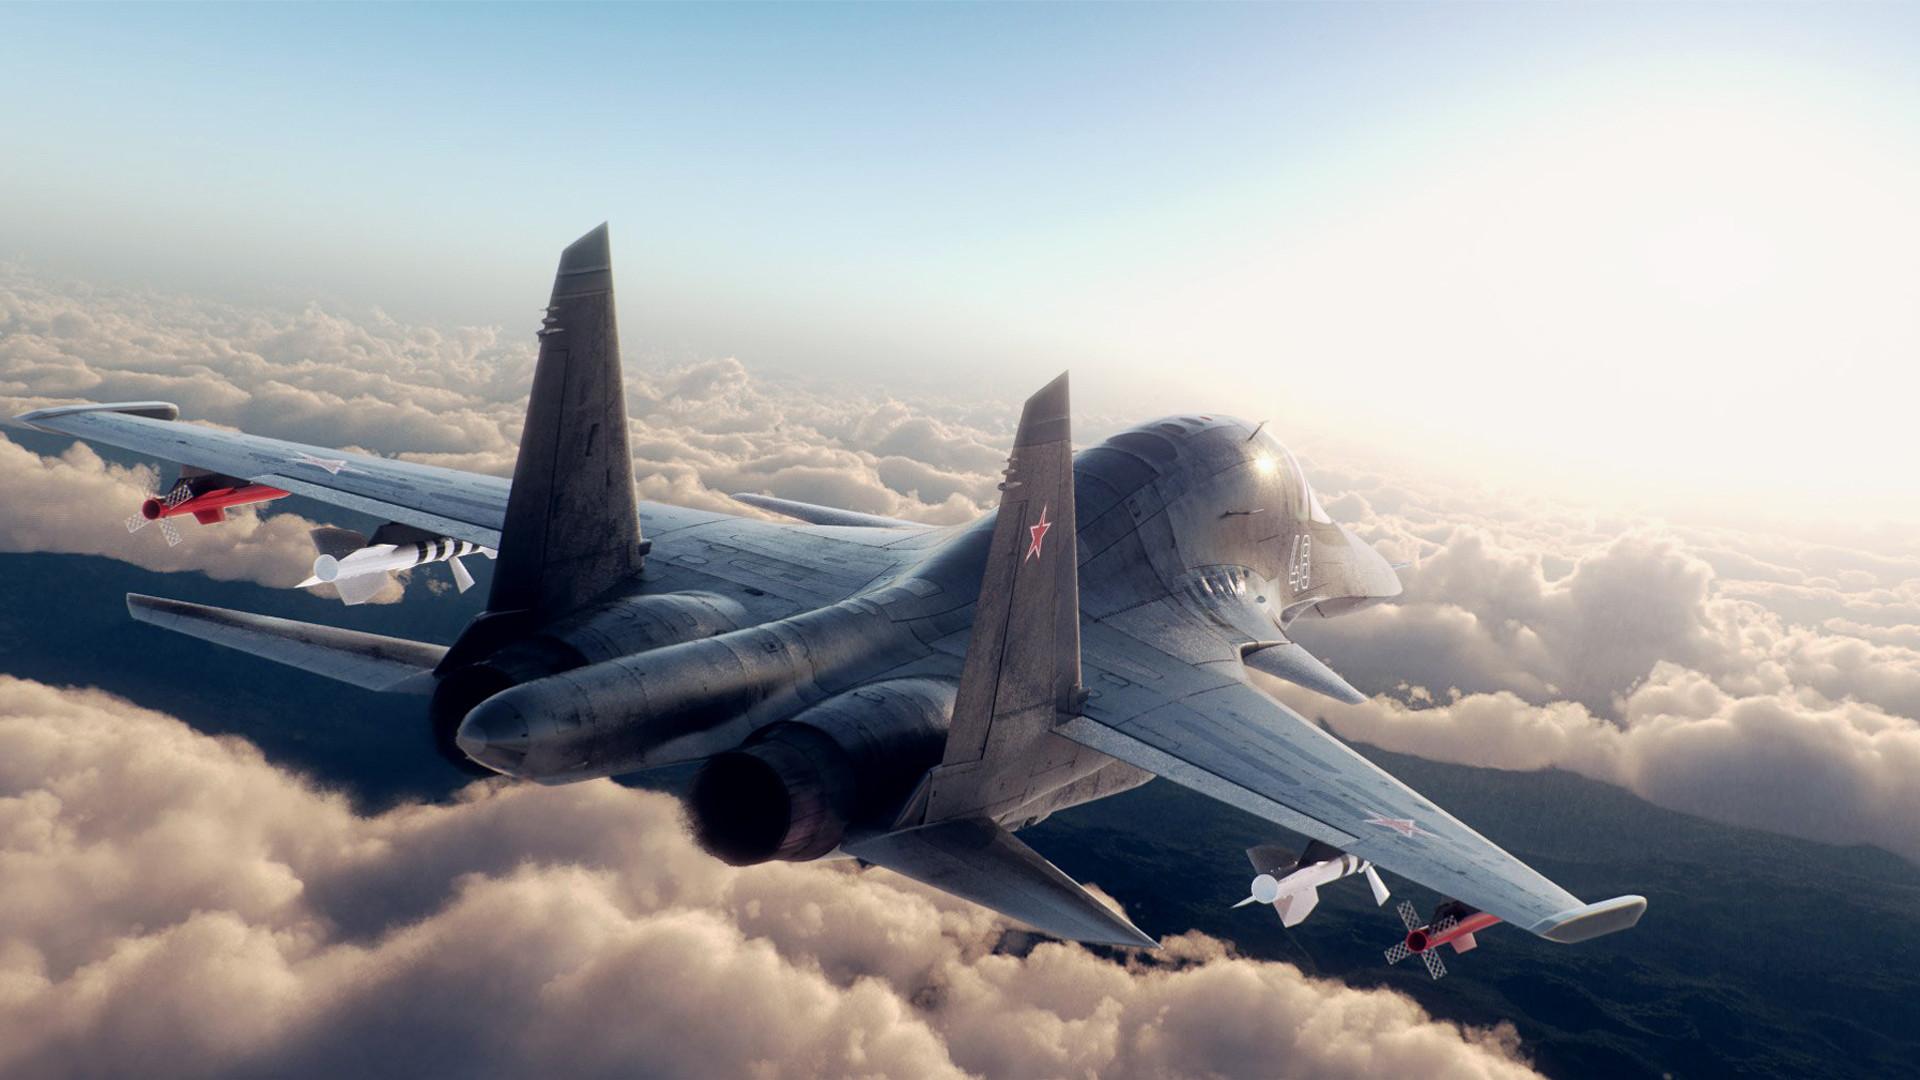 war plane wallpaper 79 images